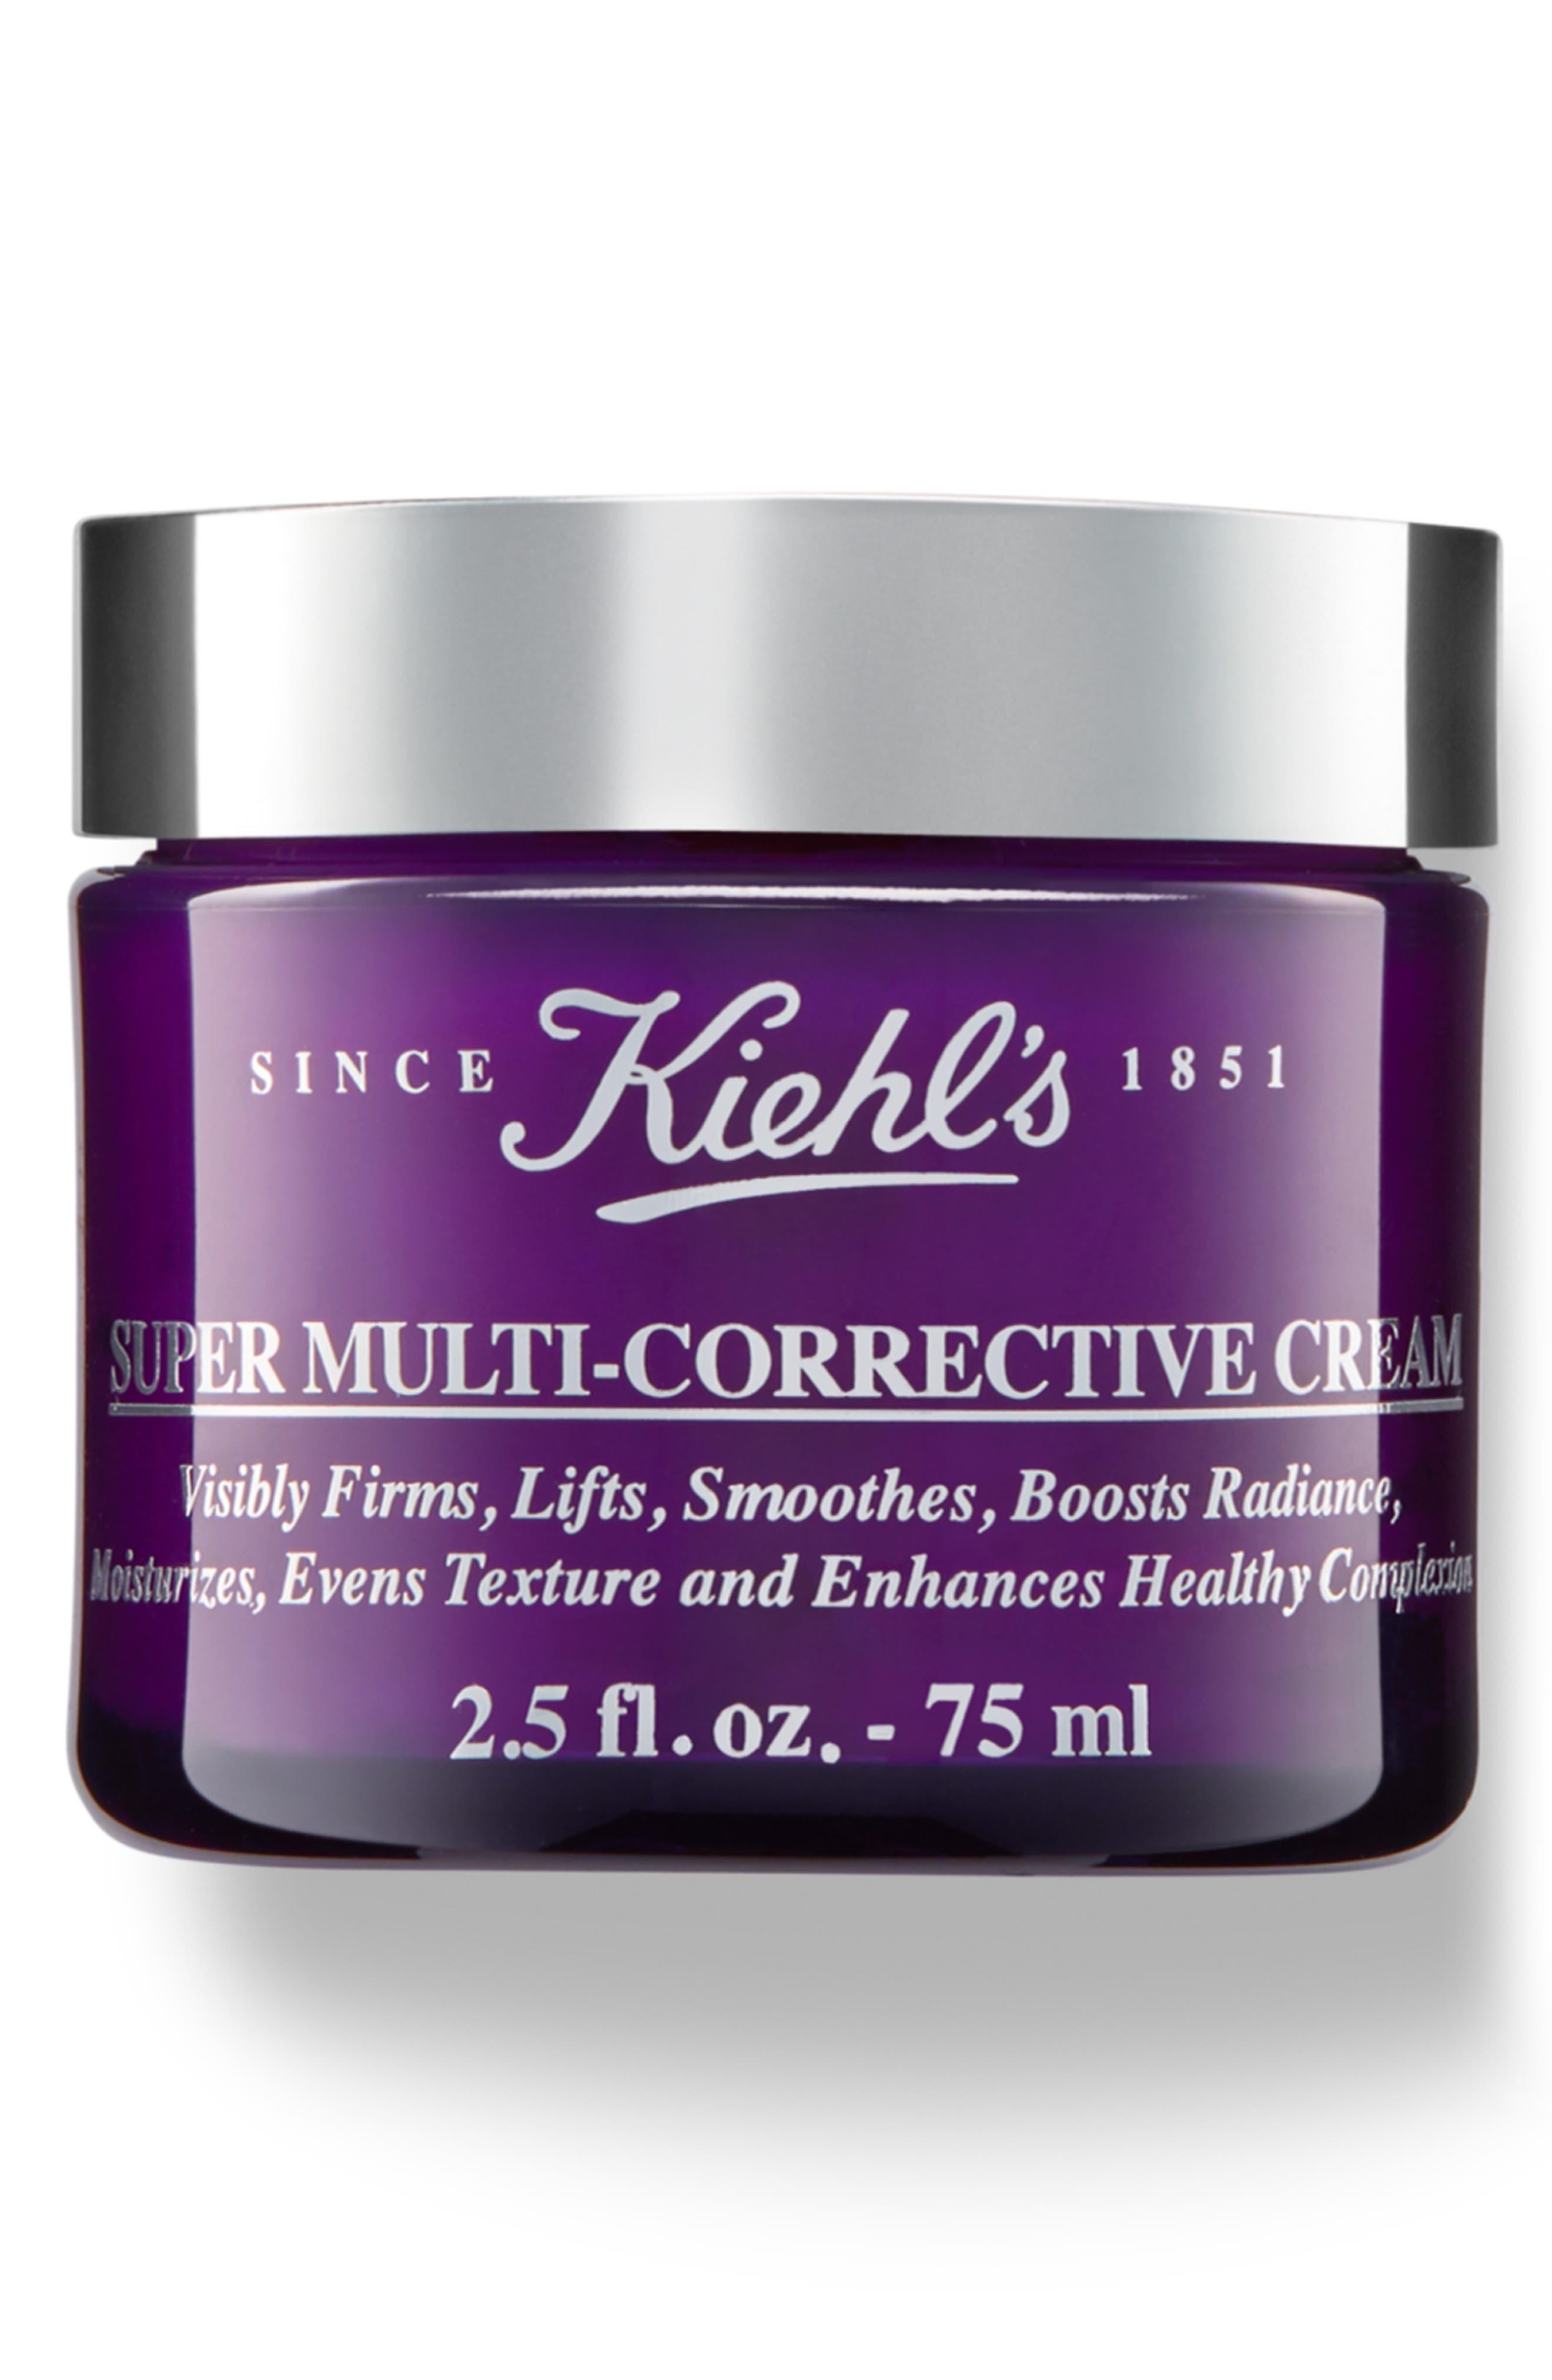 1851 Super Multi-Corrective Anti-Aging Face & Neck Cream